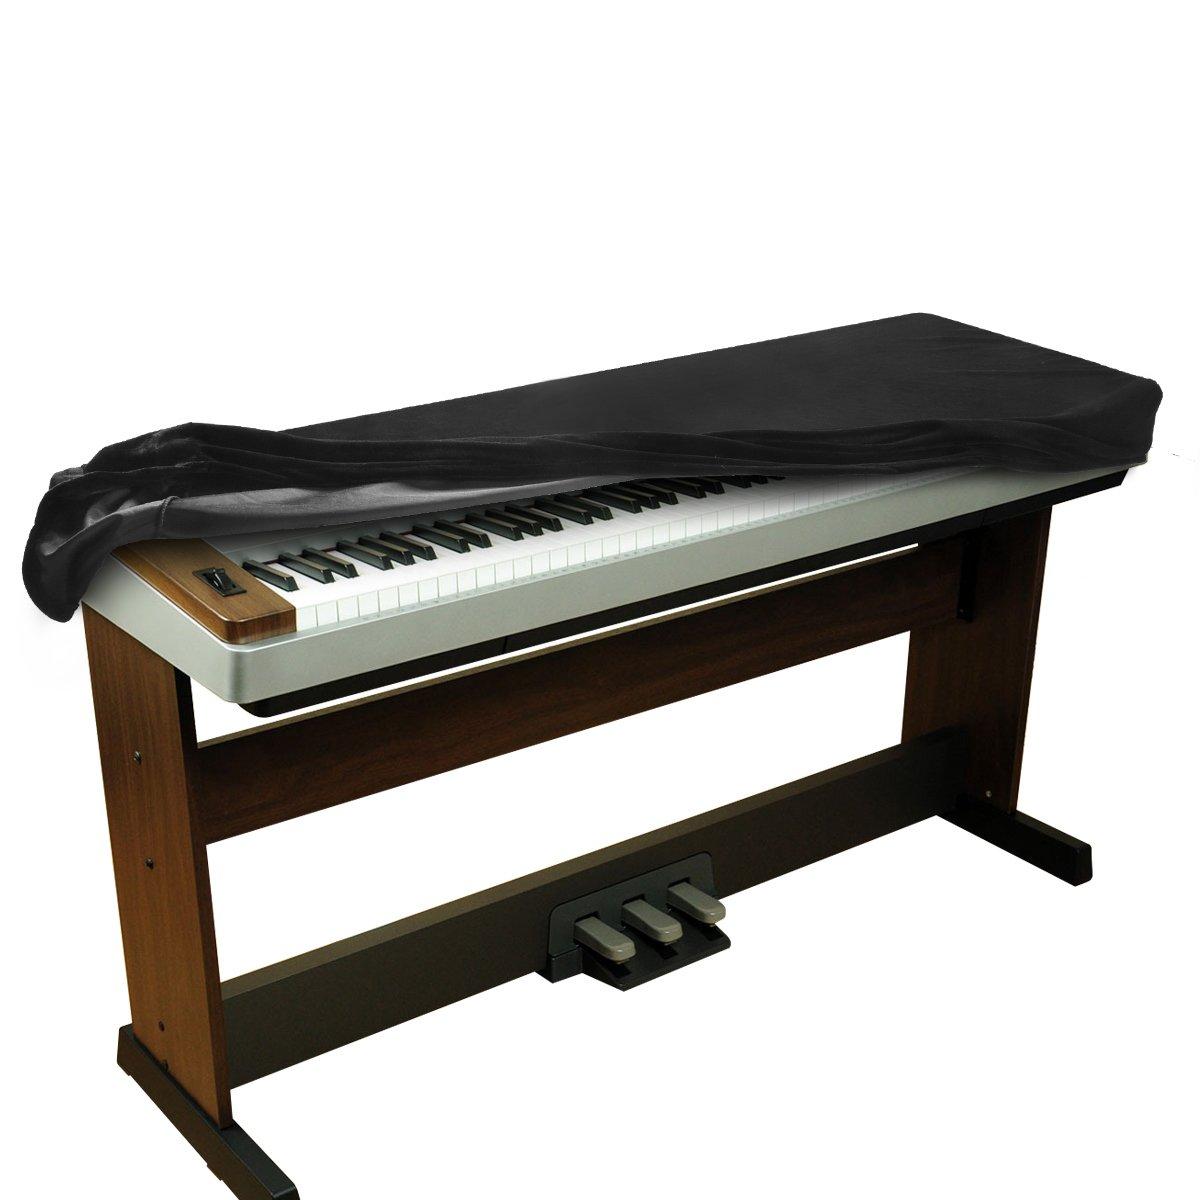 BALFER Stretchable Velvet Piano Keyboard Dust Cover 88 Keys (88 Keys)